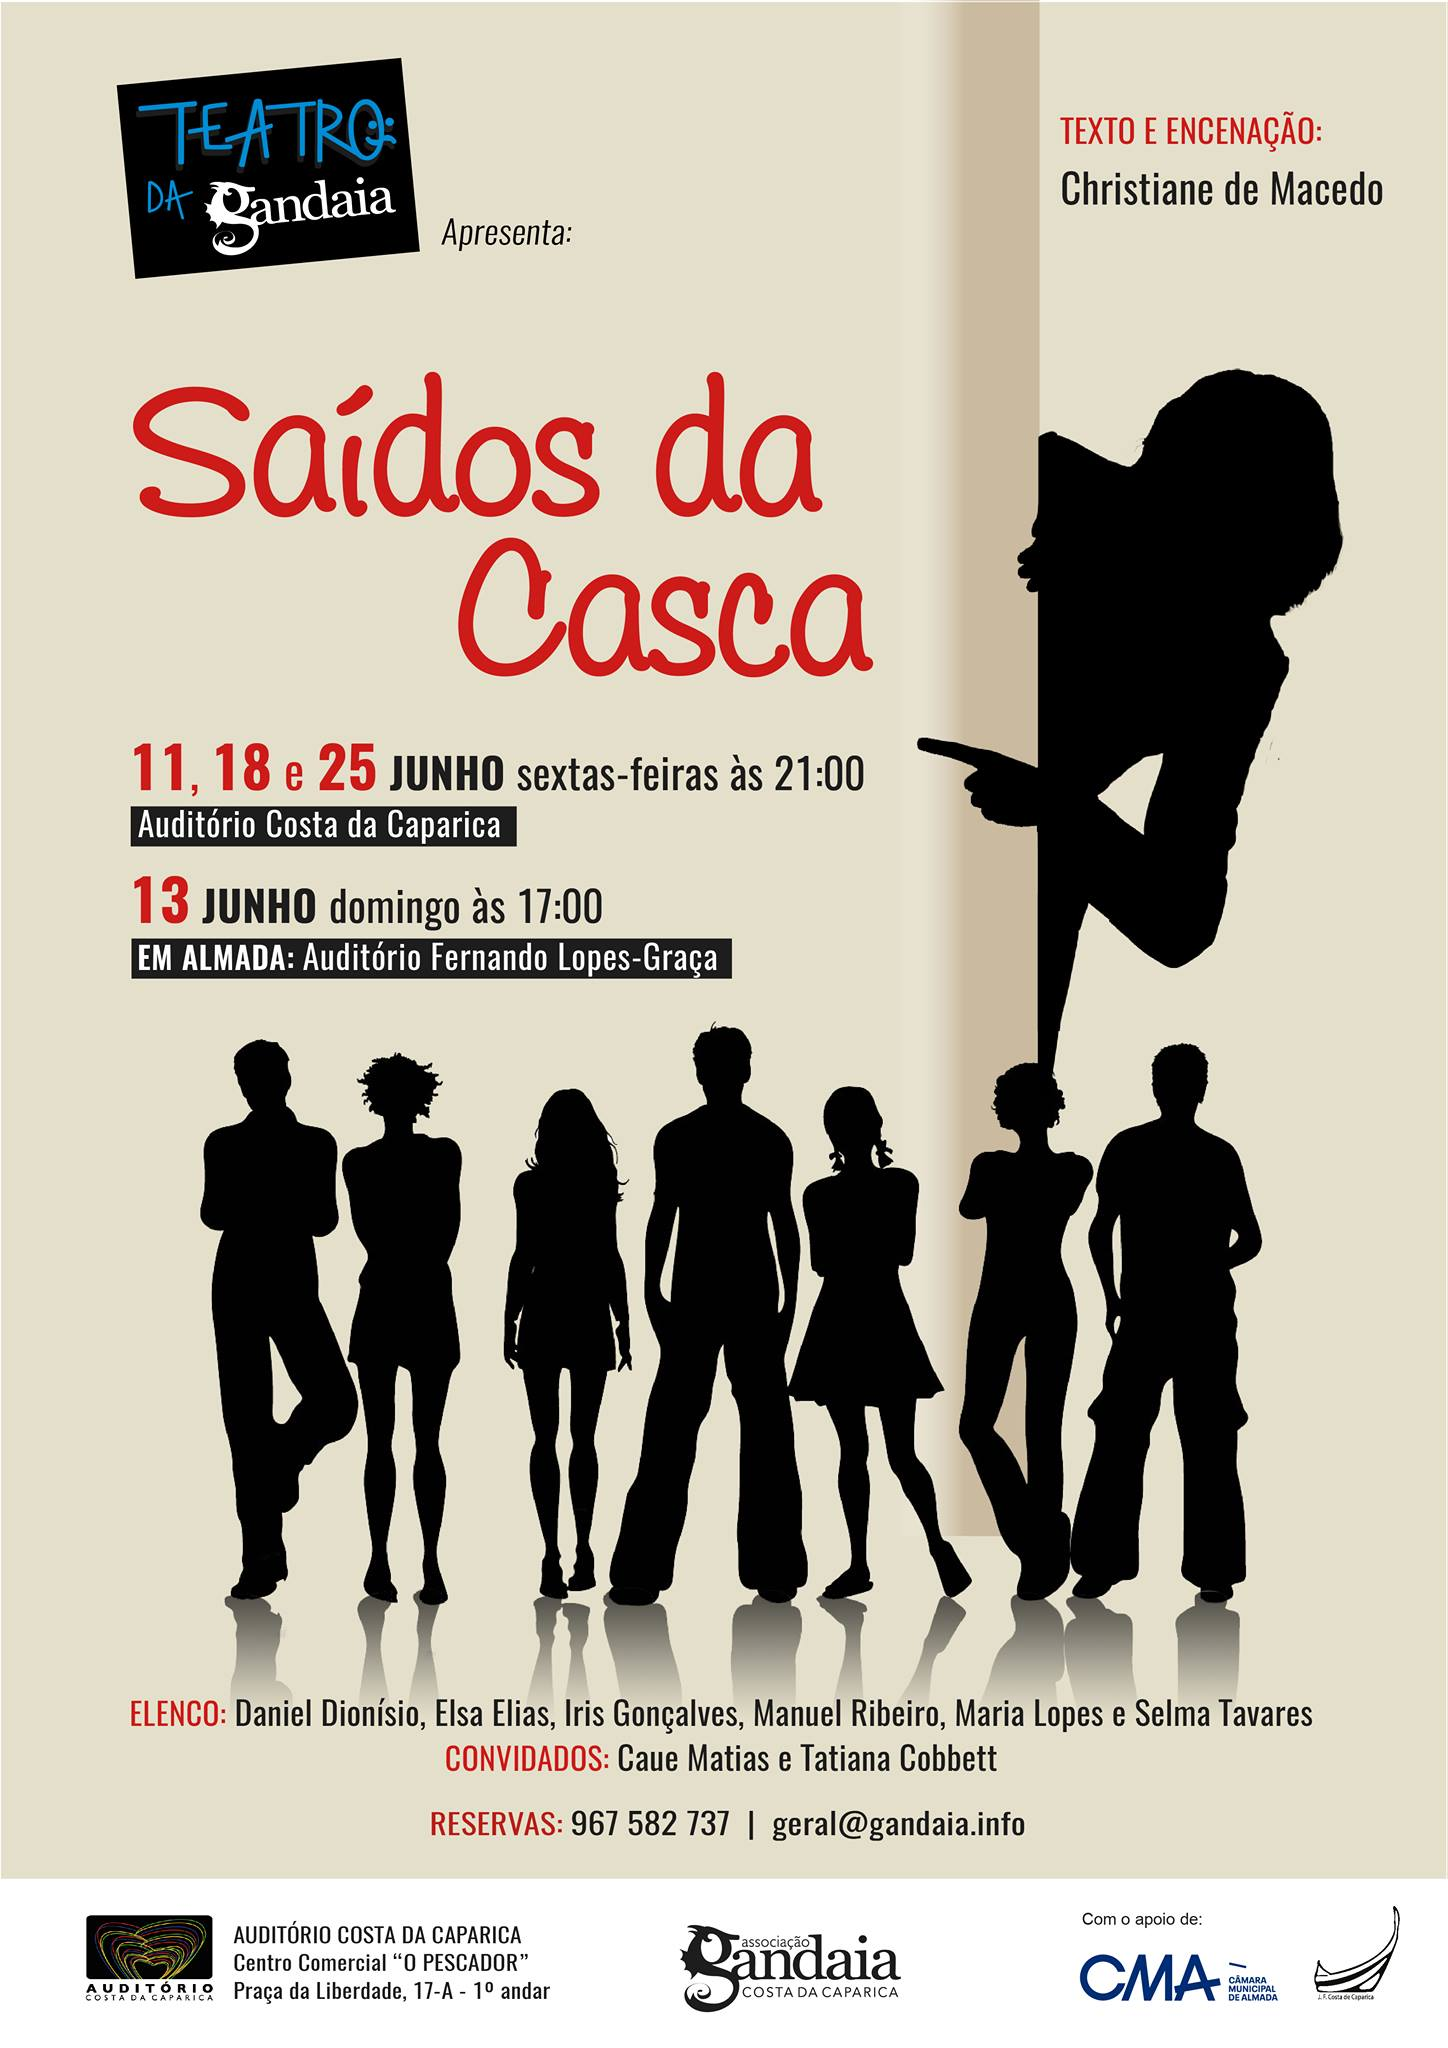 Teatro da Gandaia - Saídos da Casca